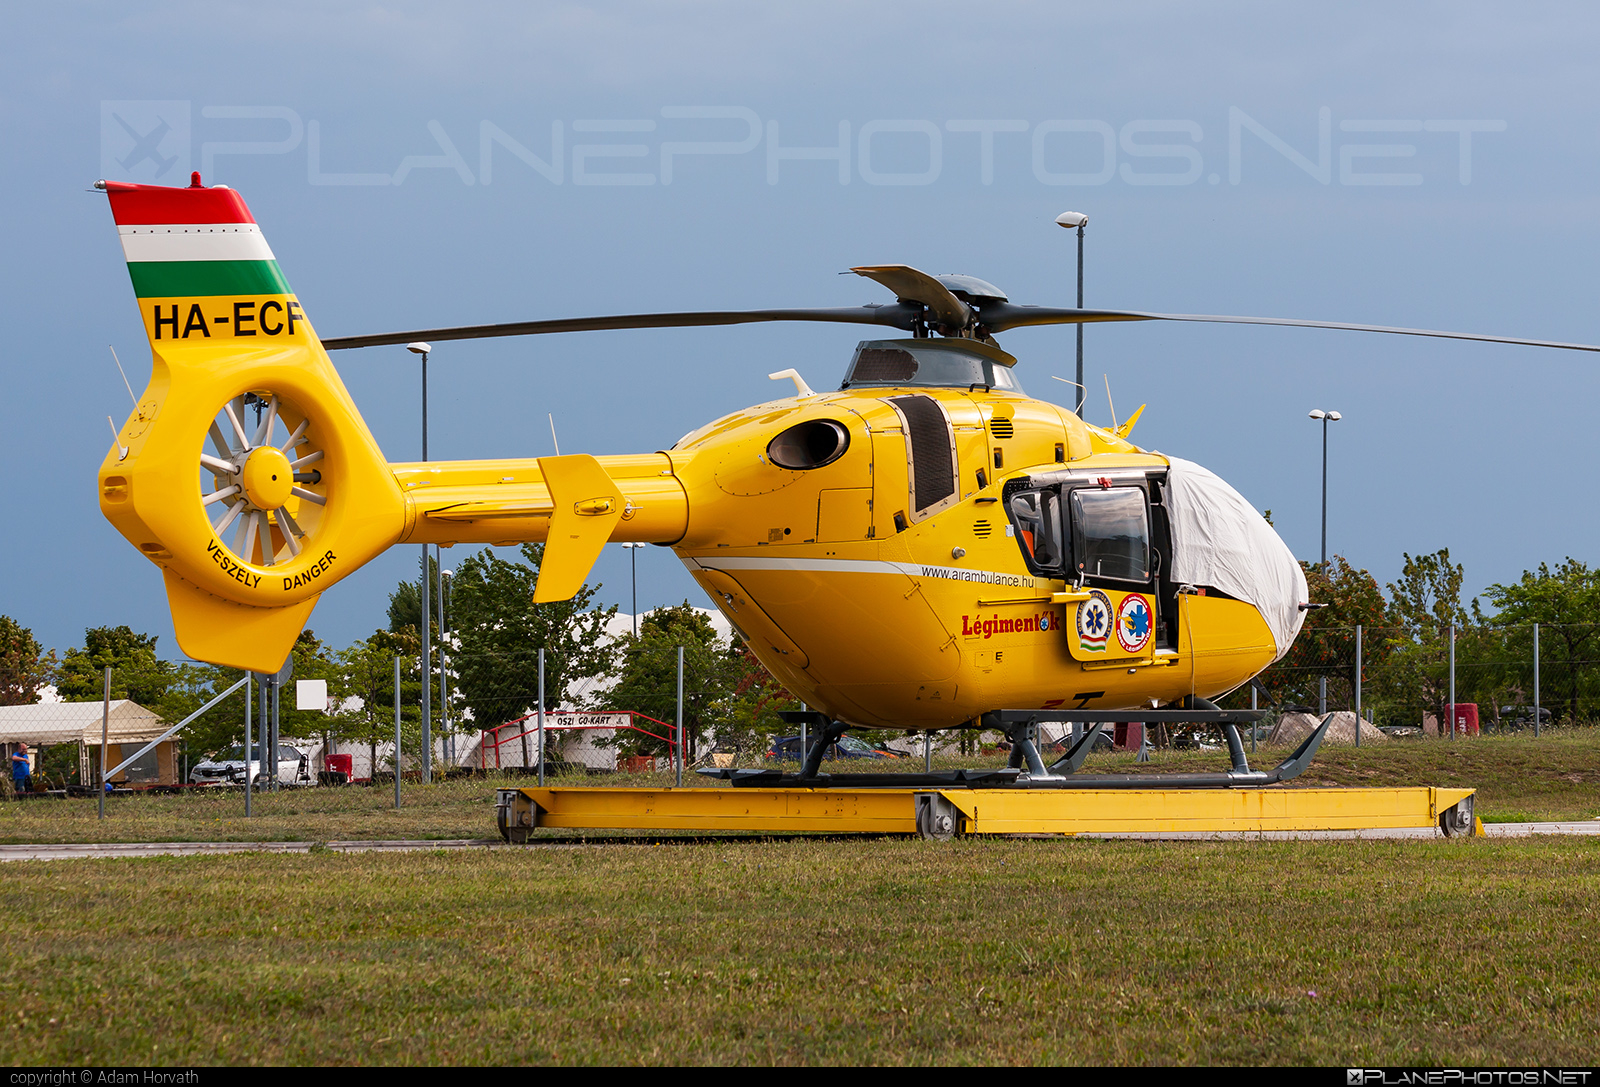 Eurocopter EC135 T2 - HA-ECF operated by Magyar Légimentő Nonprofit (Hungarian Air Ambulance) #ec135 #ec135t2 #eurocopter #hungarianairambulance #magyarlegimentononprofit